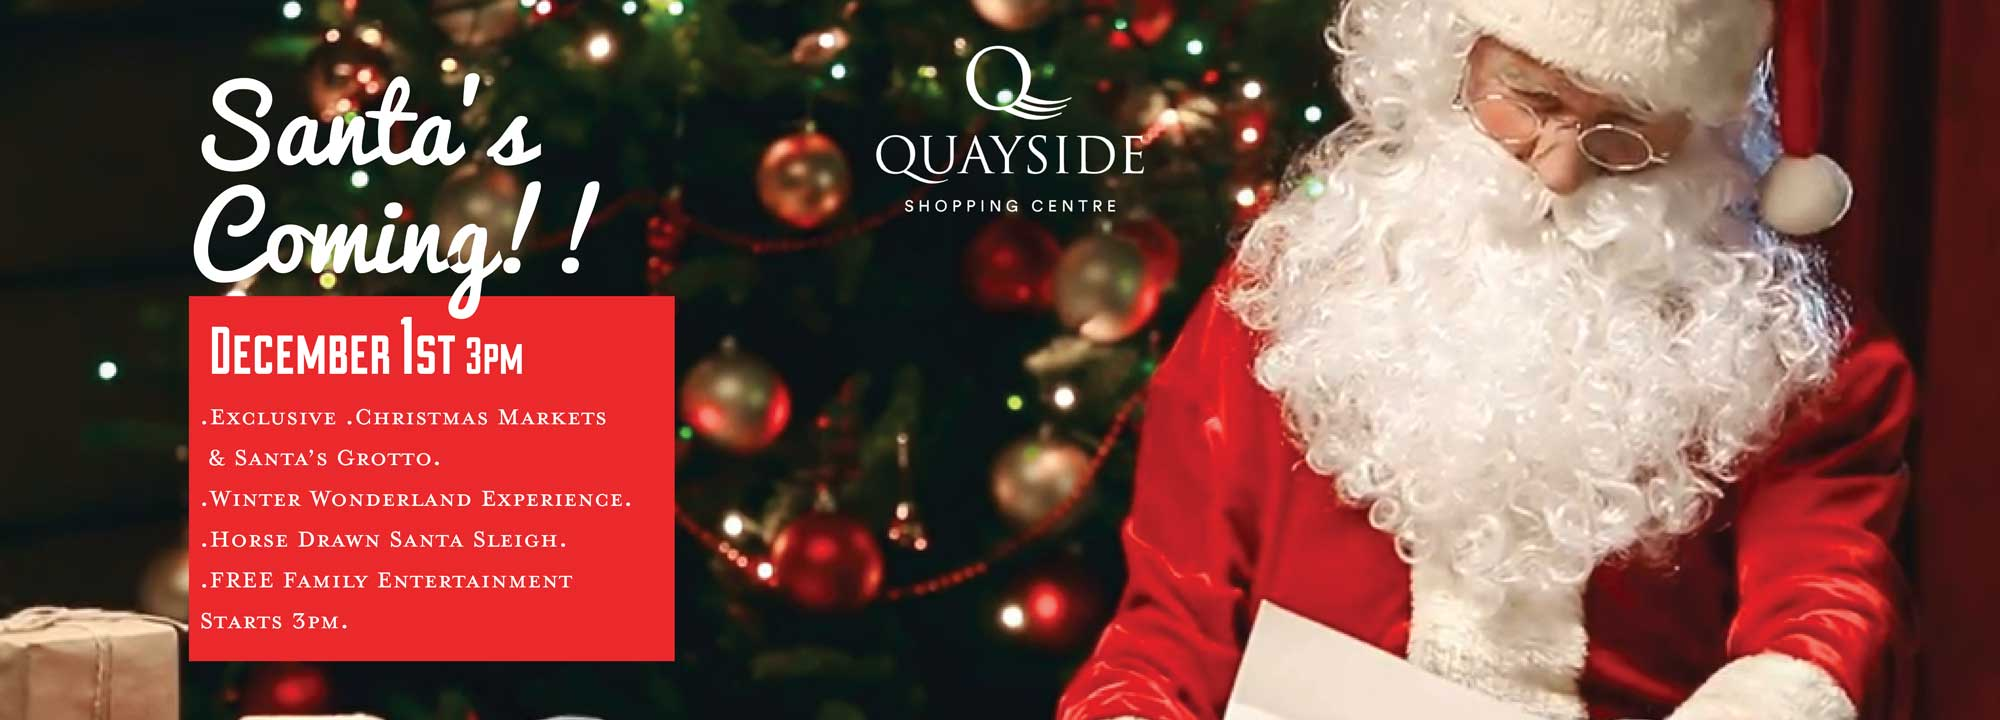 Santa's coming! 1st December, 3pm